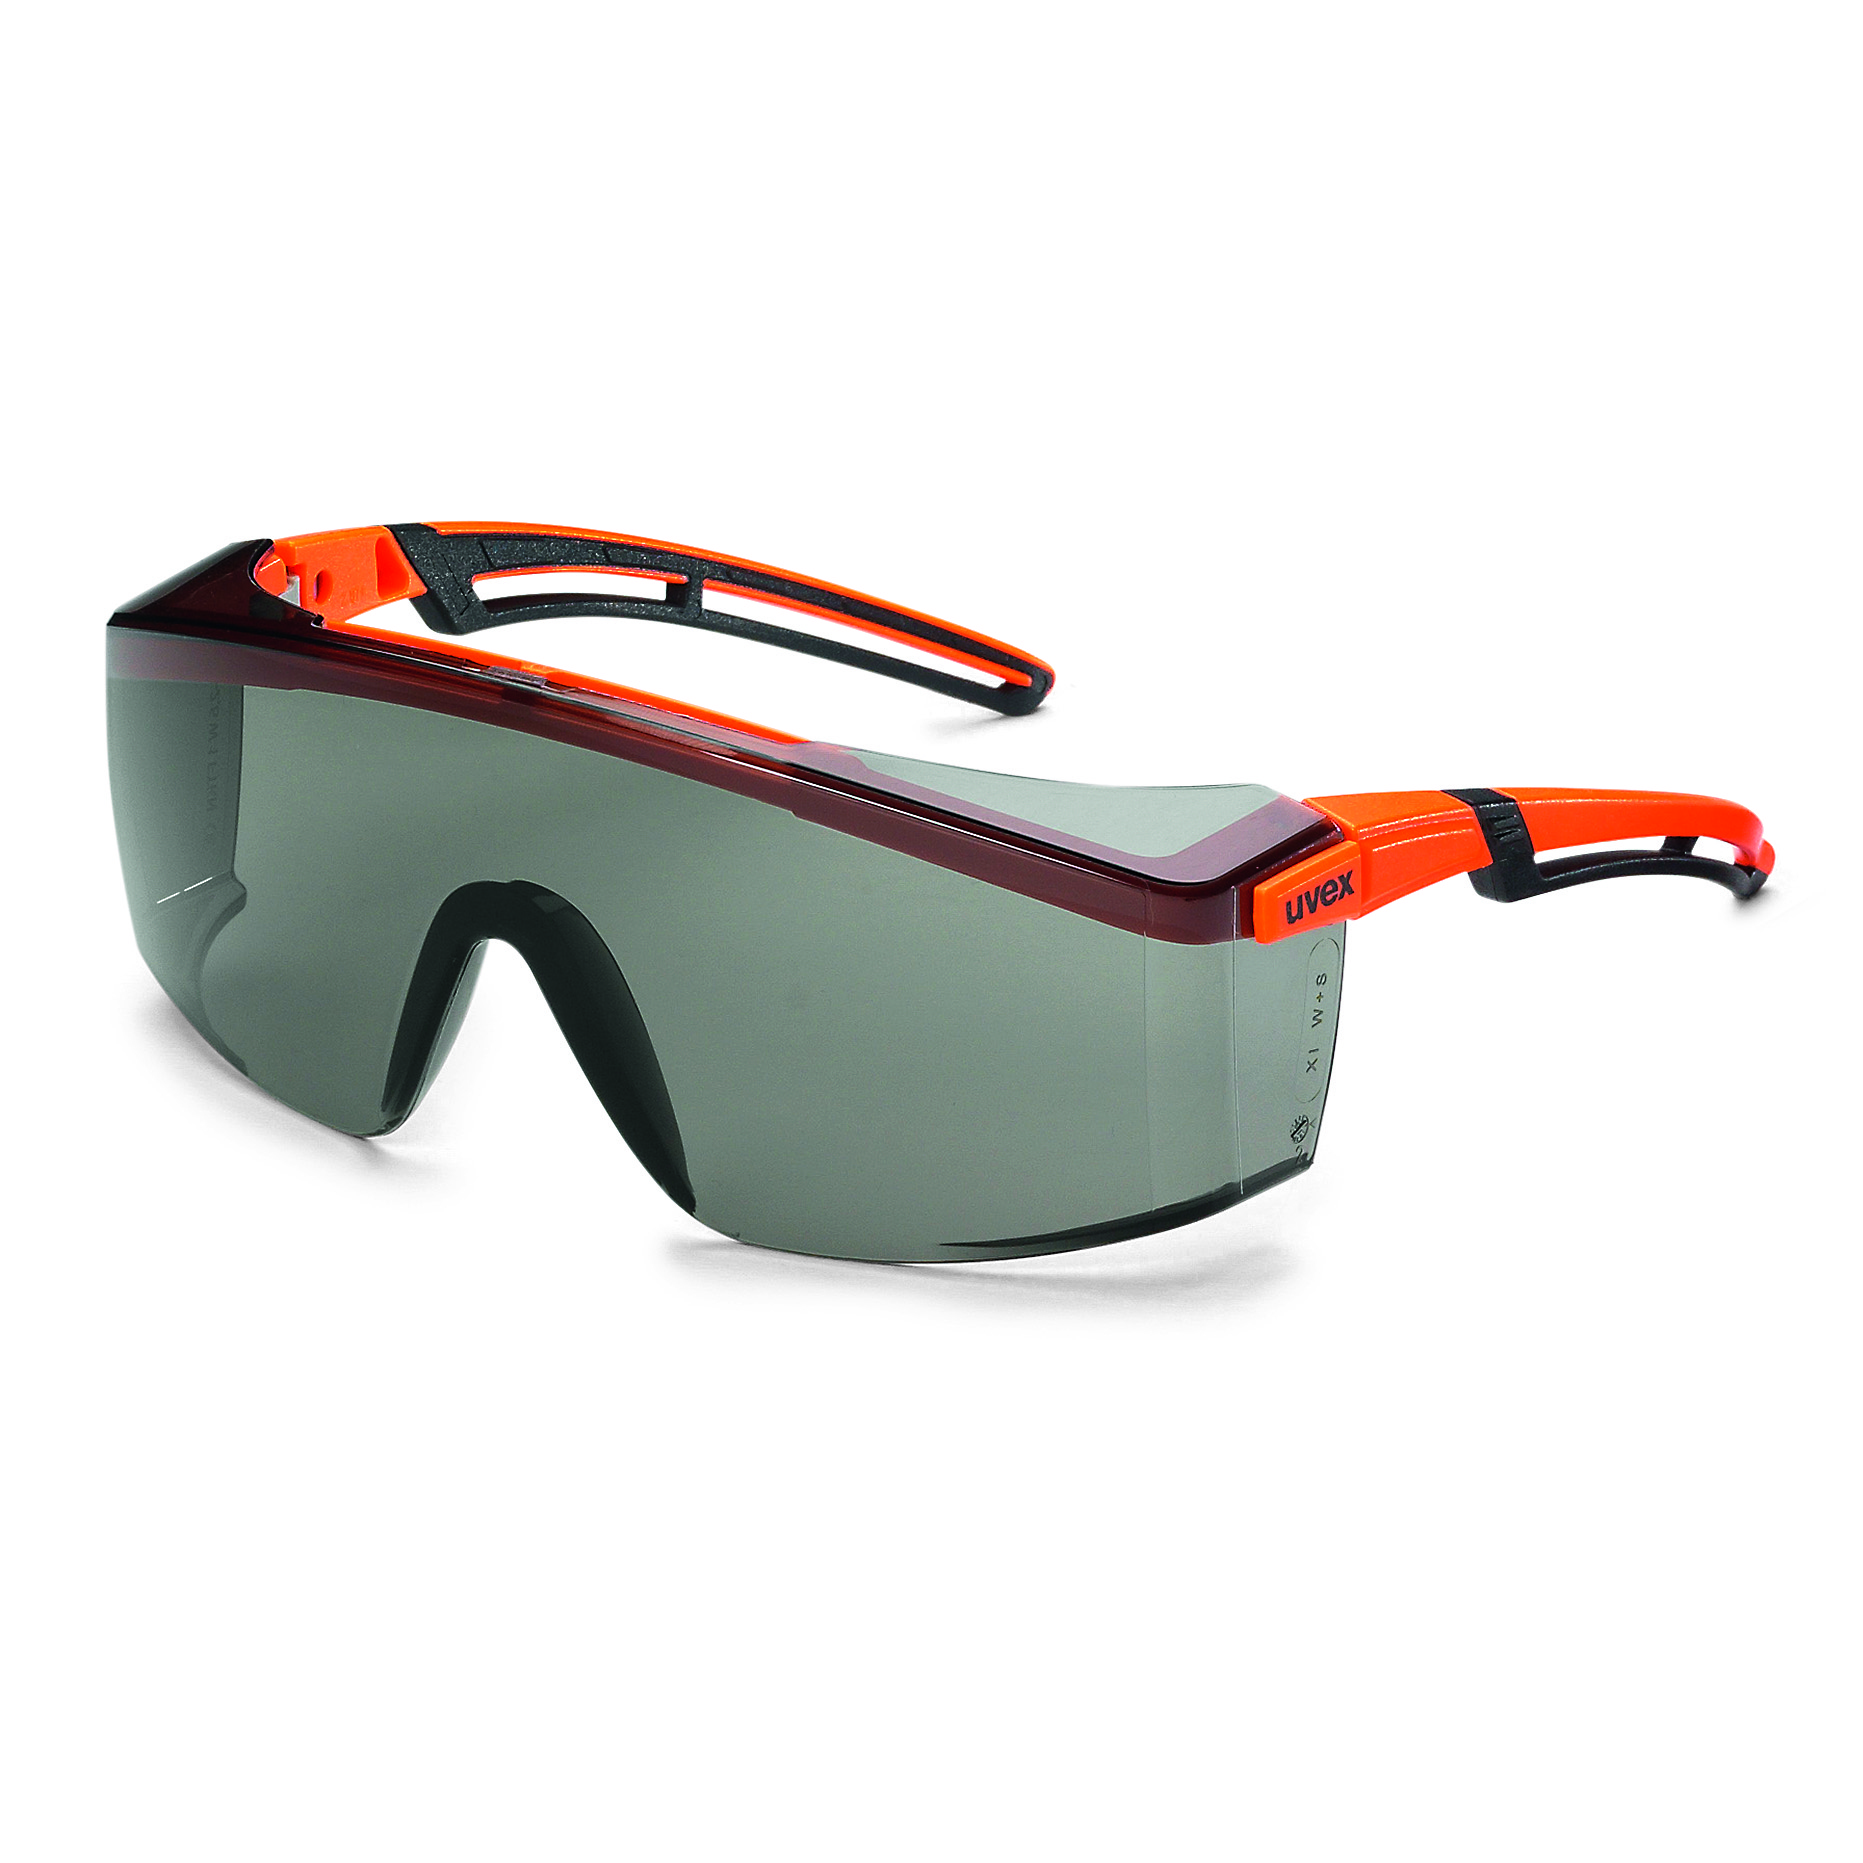 uvex 9164 - astrospec 2.0 - Schutzbrille